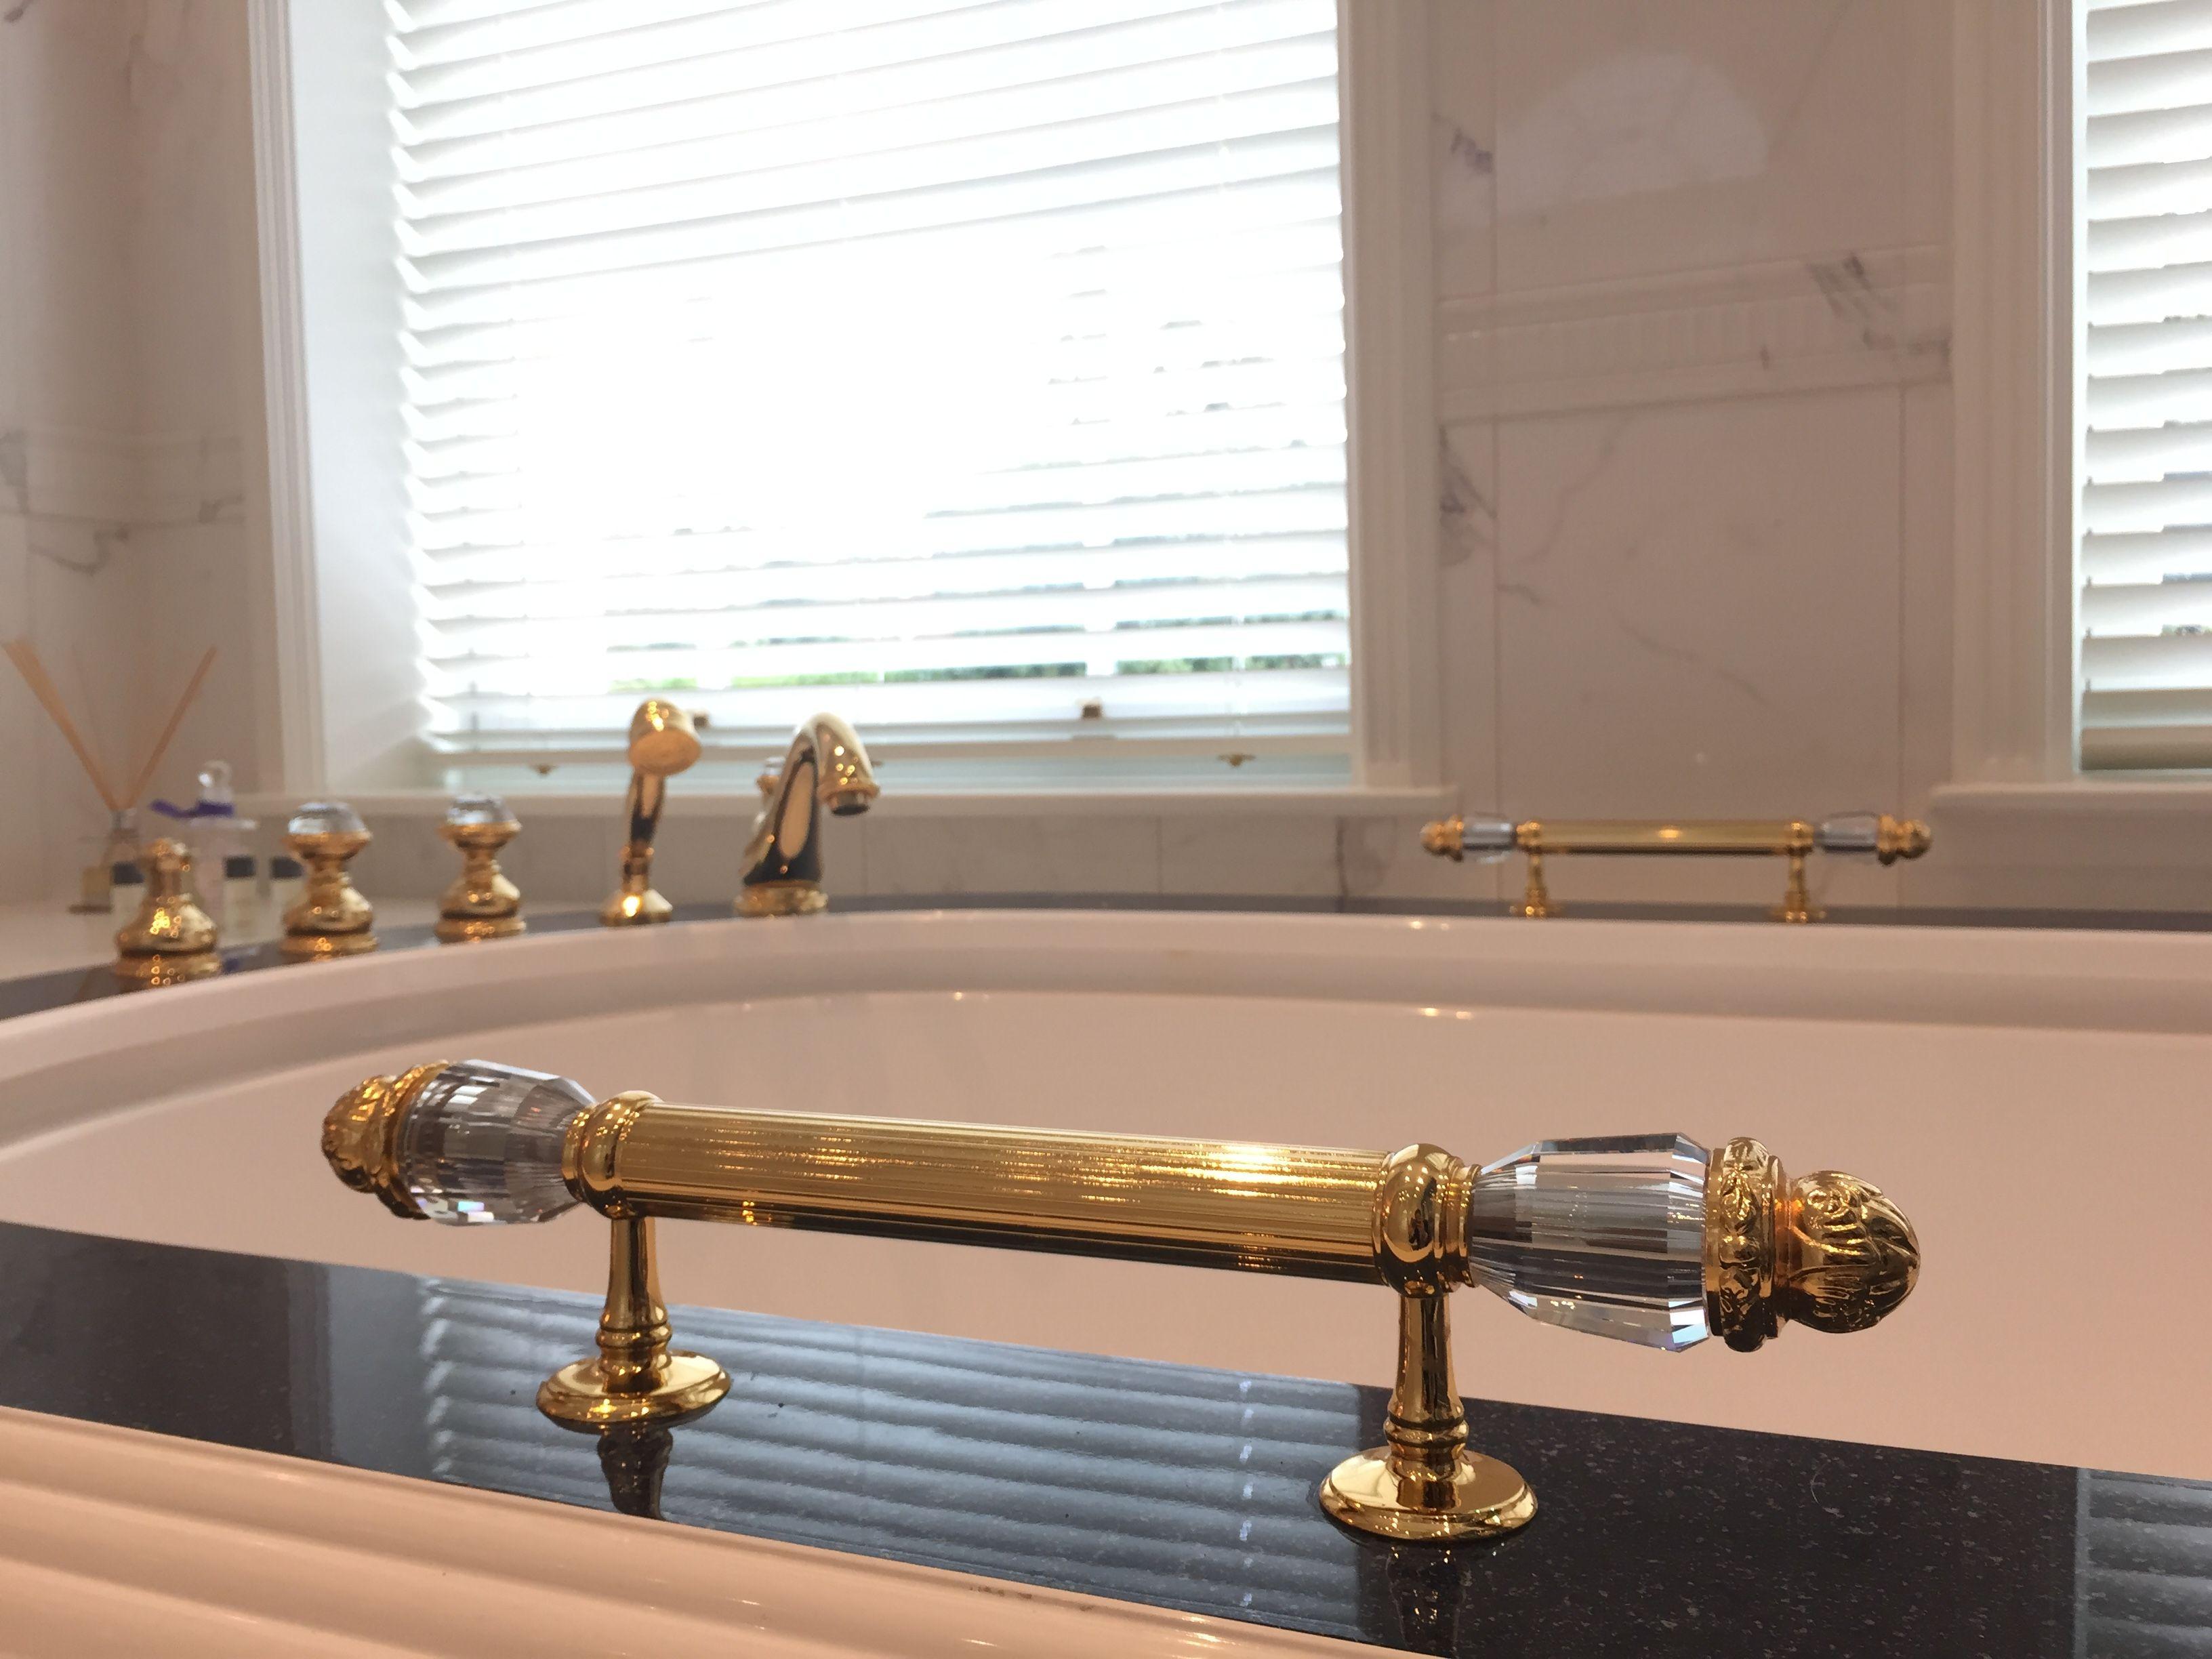 Swarovski Badezimmer ~ Classic bathroom with gold and swarovski crystal by bronces mestre